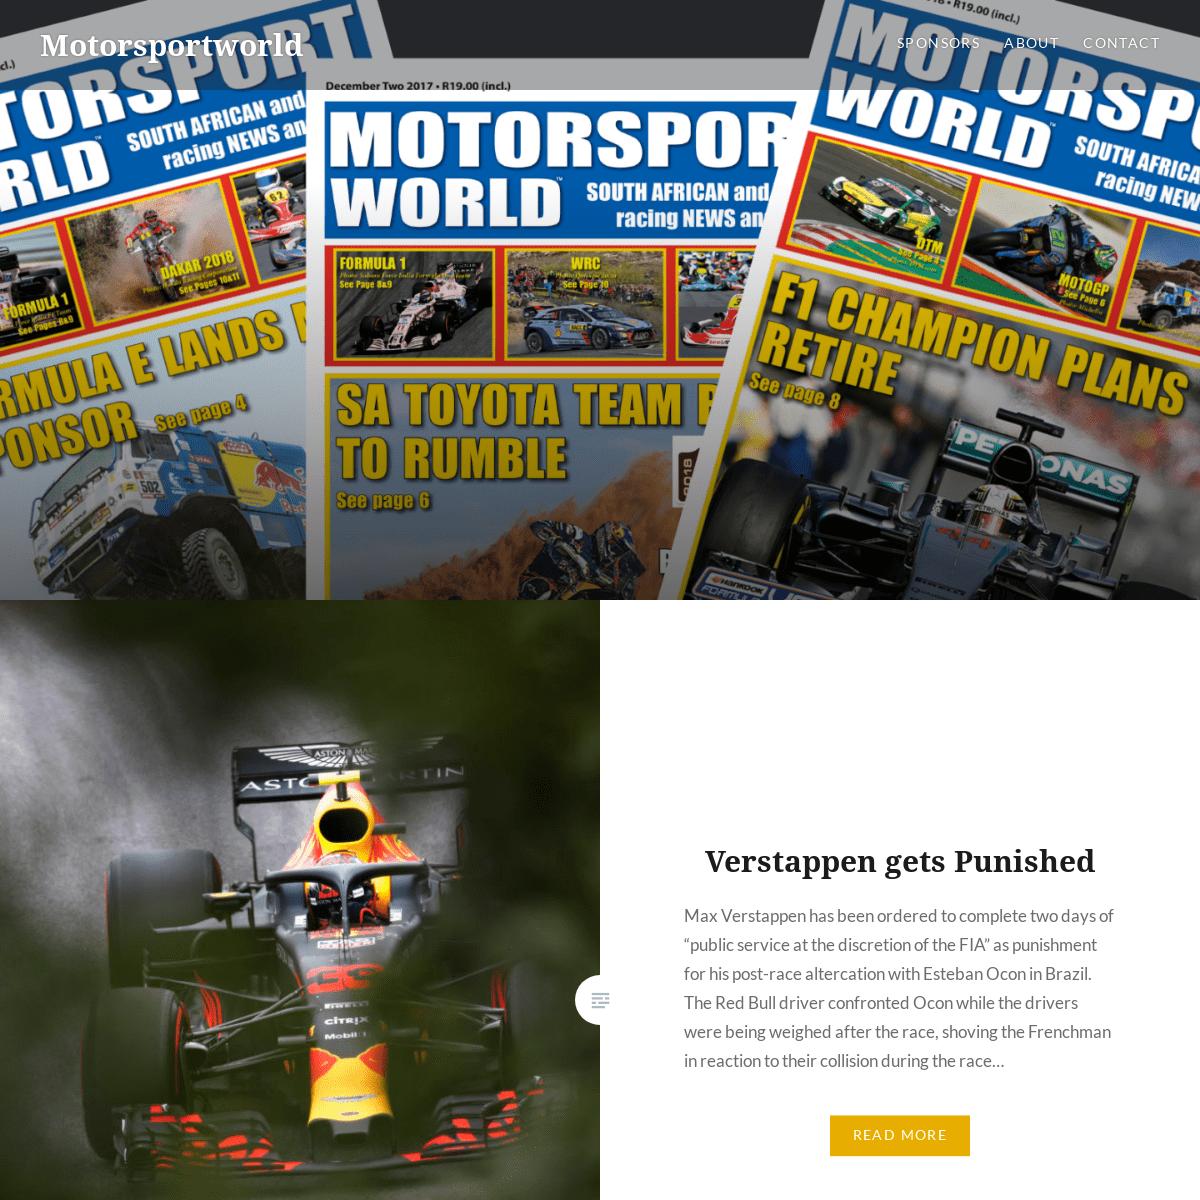 Motorsportworld -